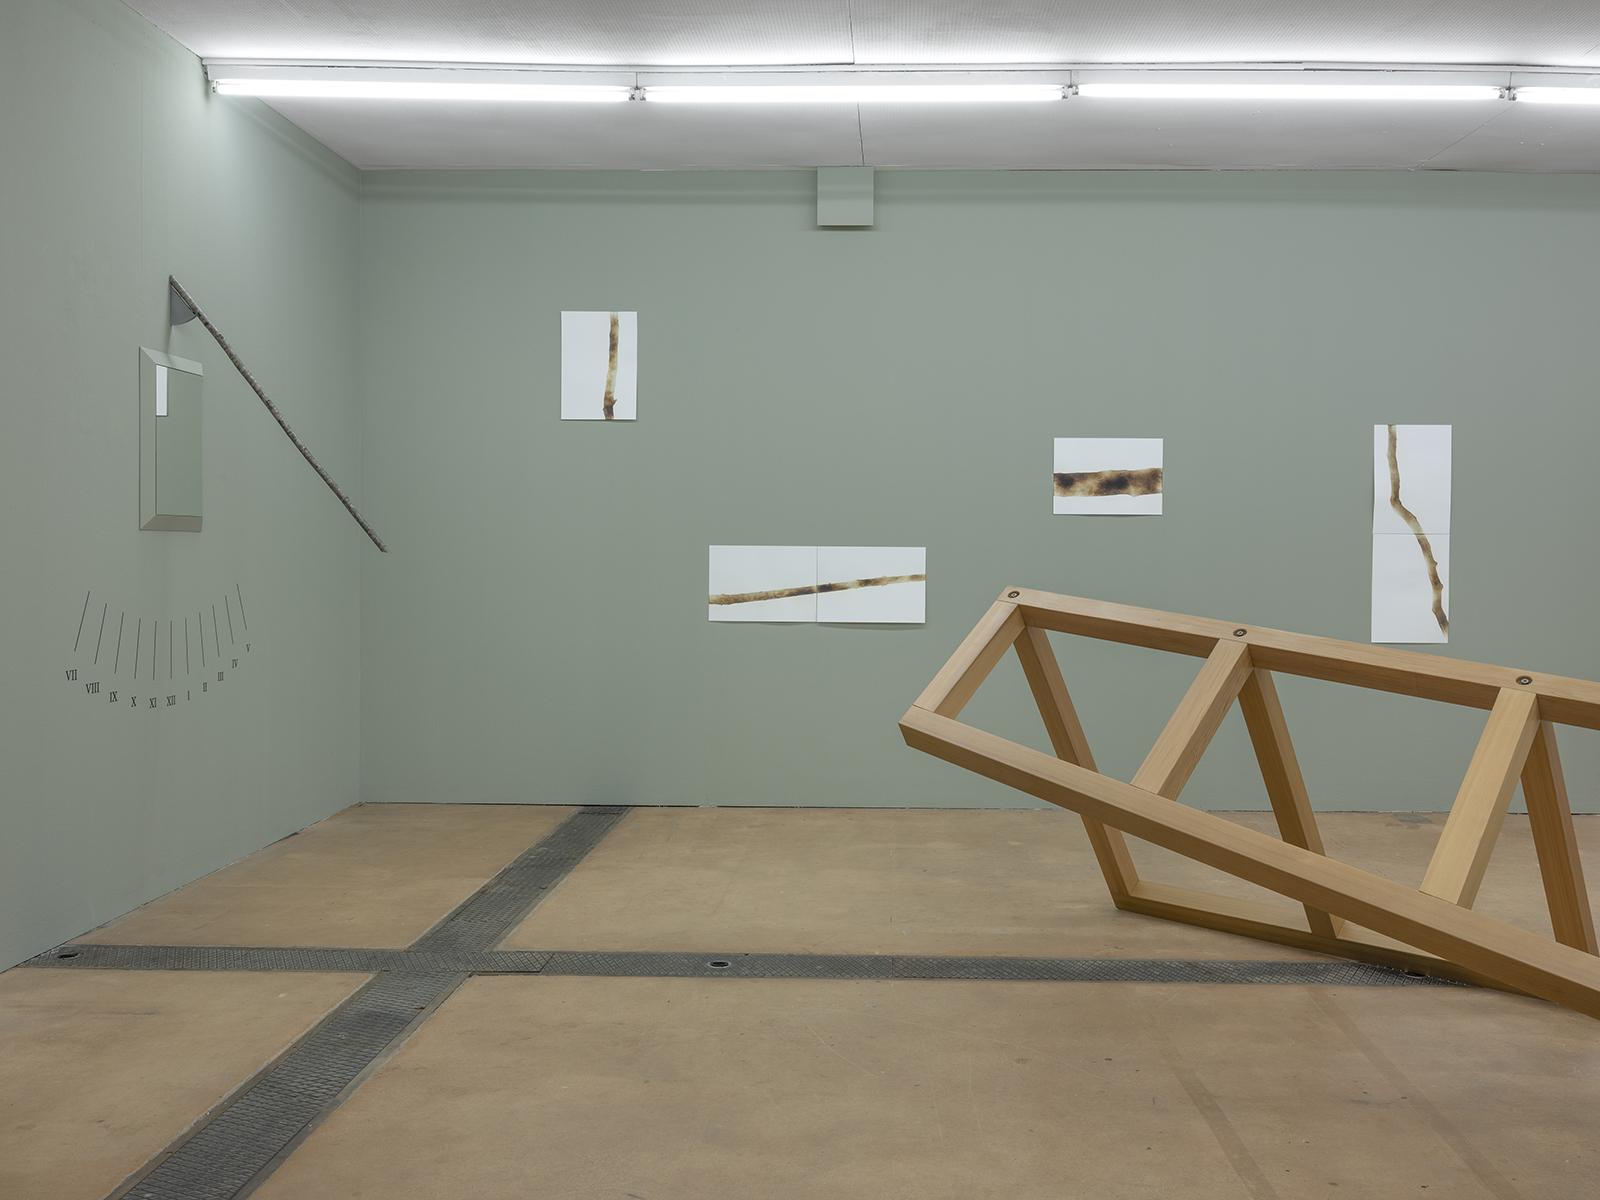 Benoit-Delaunay-artiste-installations-2018-Un Sens du Dialogue-07